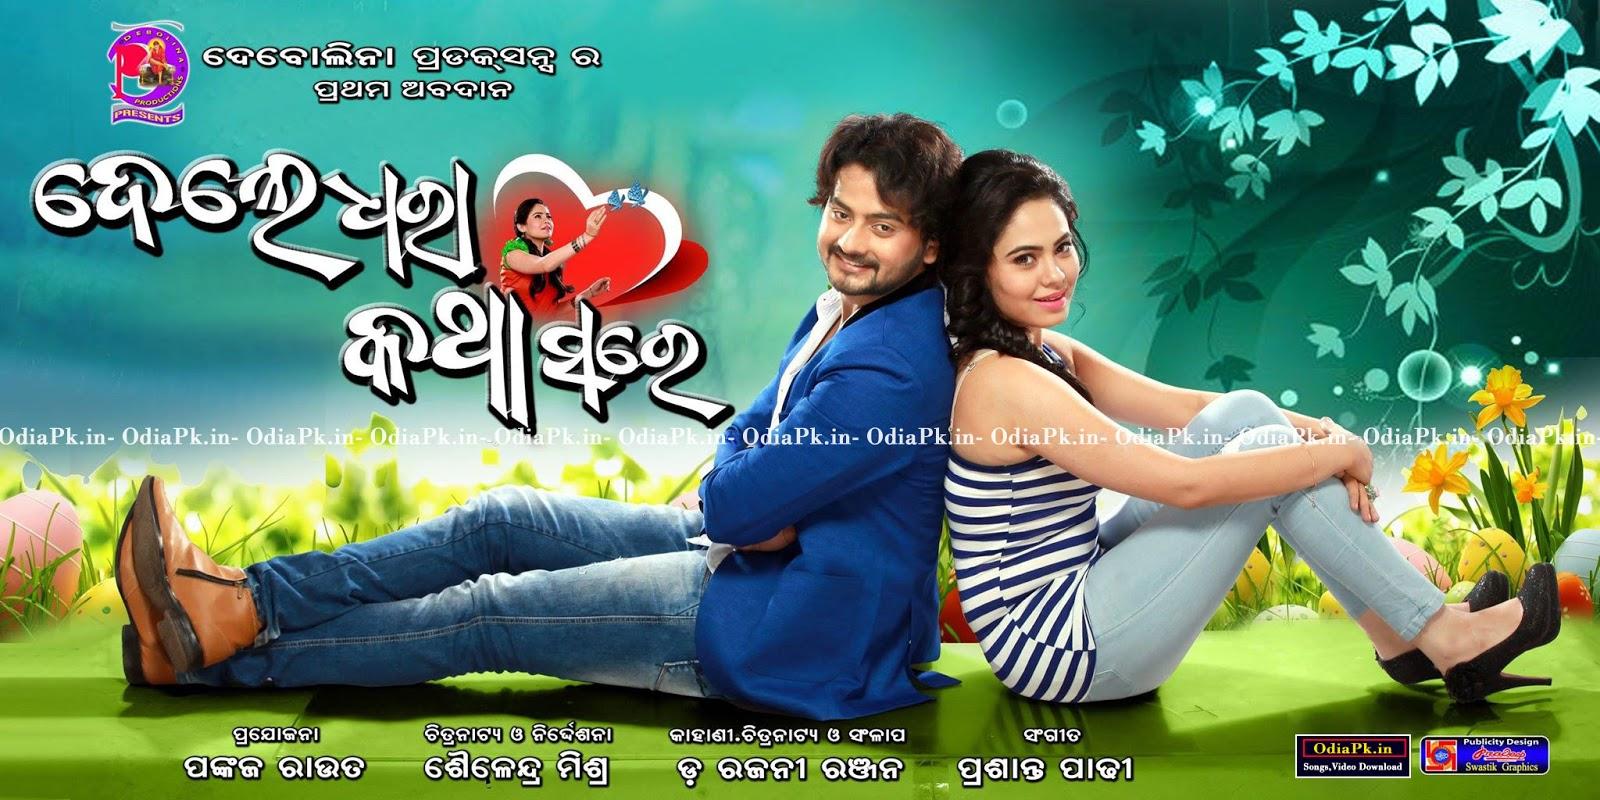 Dele Dhara Katha Sare New Odia Film All Original Mp3  Odia New Movie Songs,Video Full Movie -9918